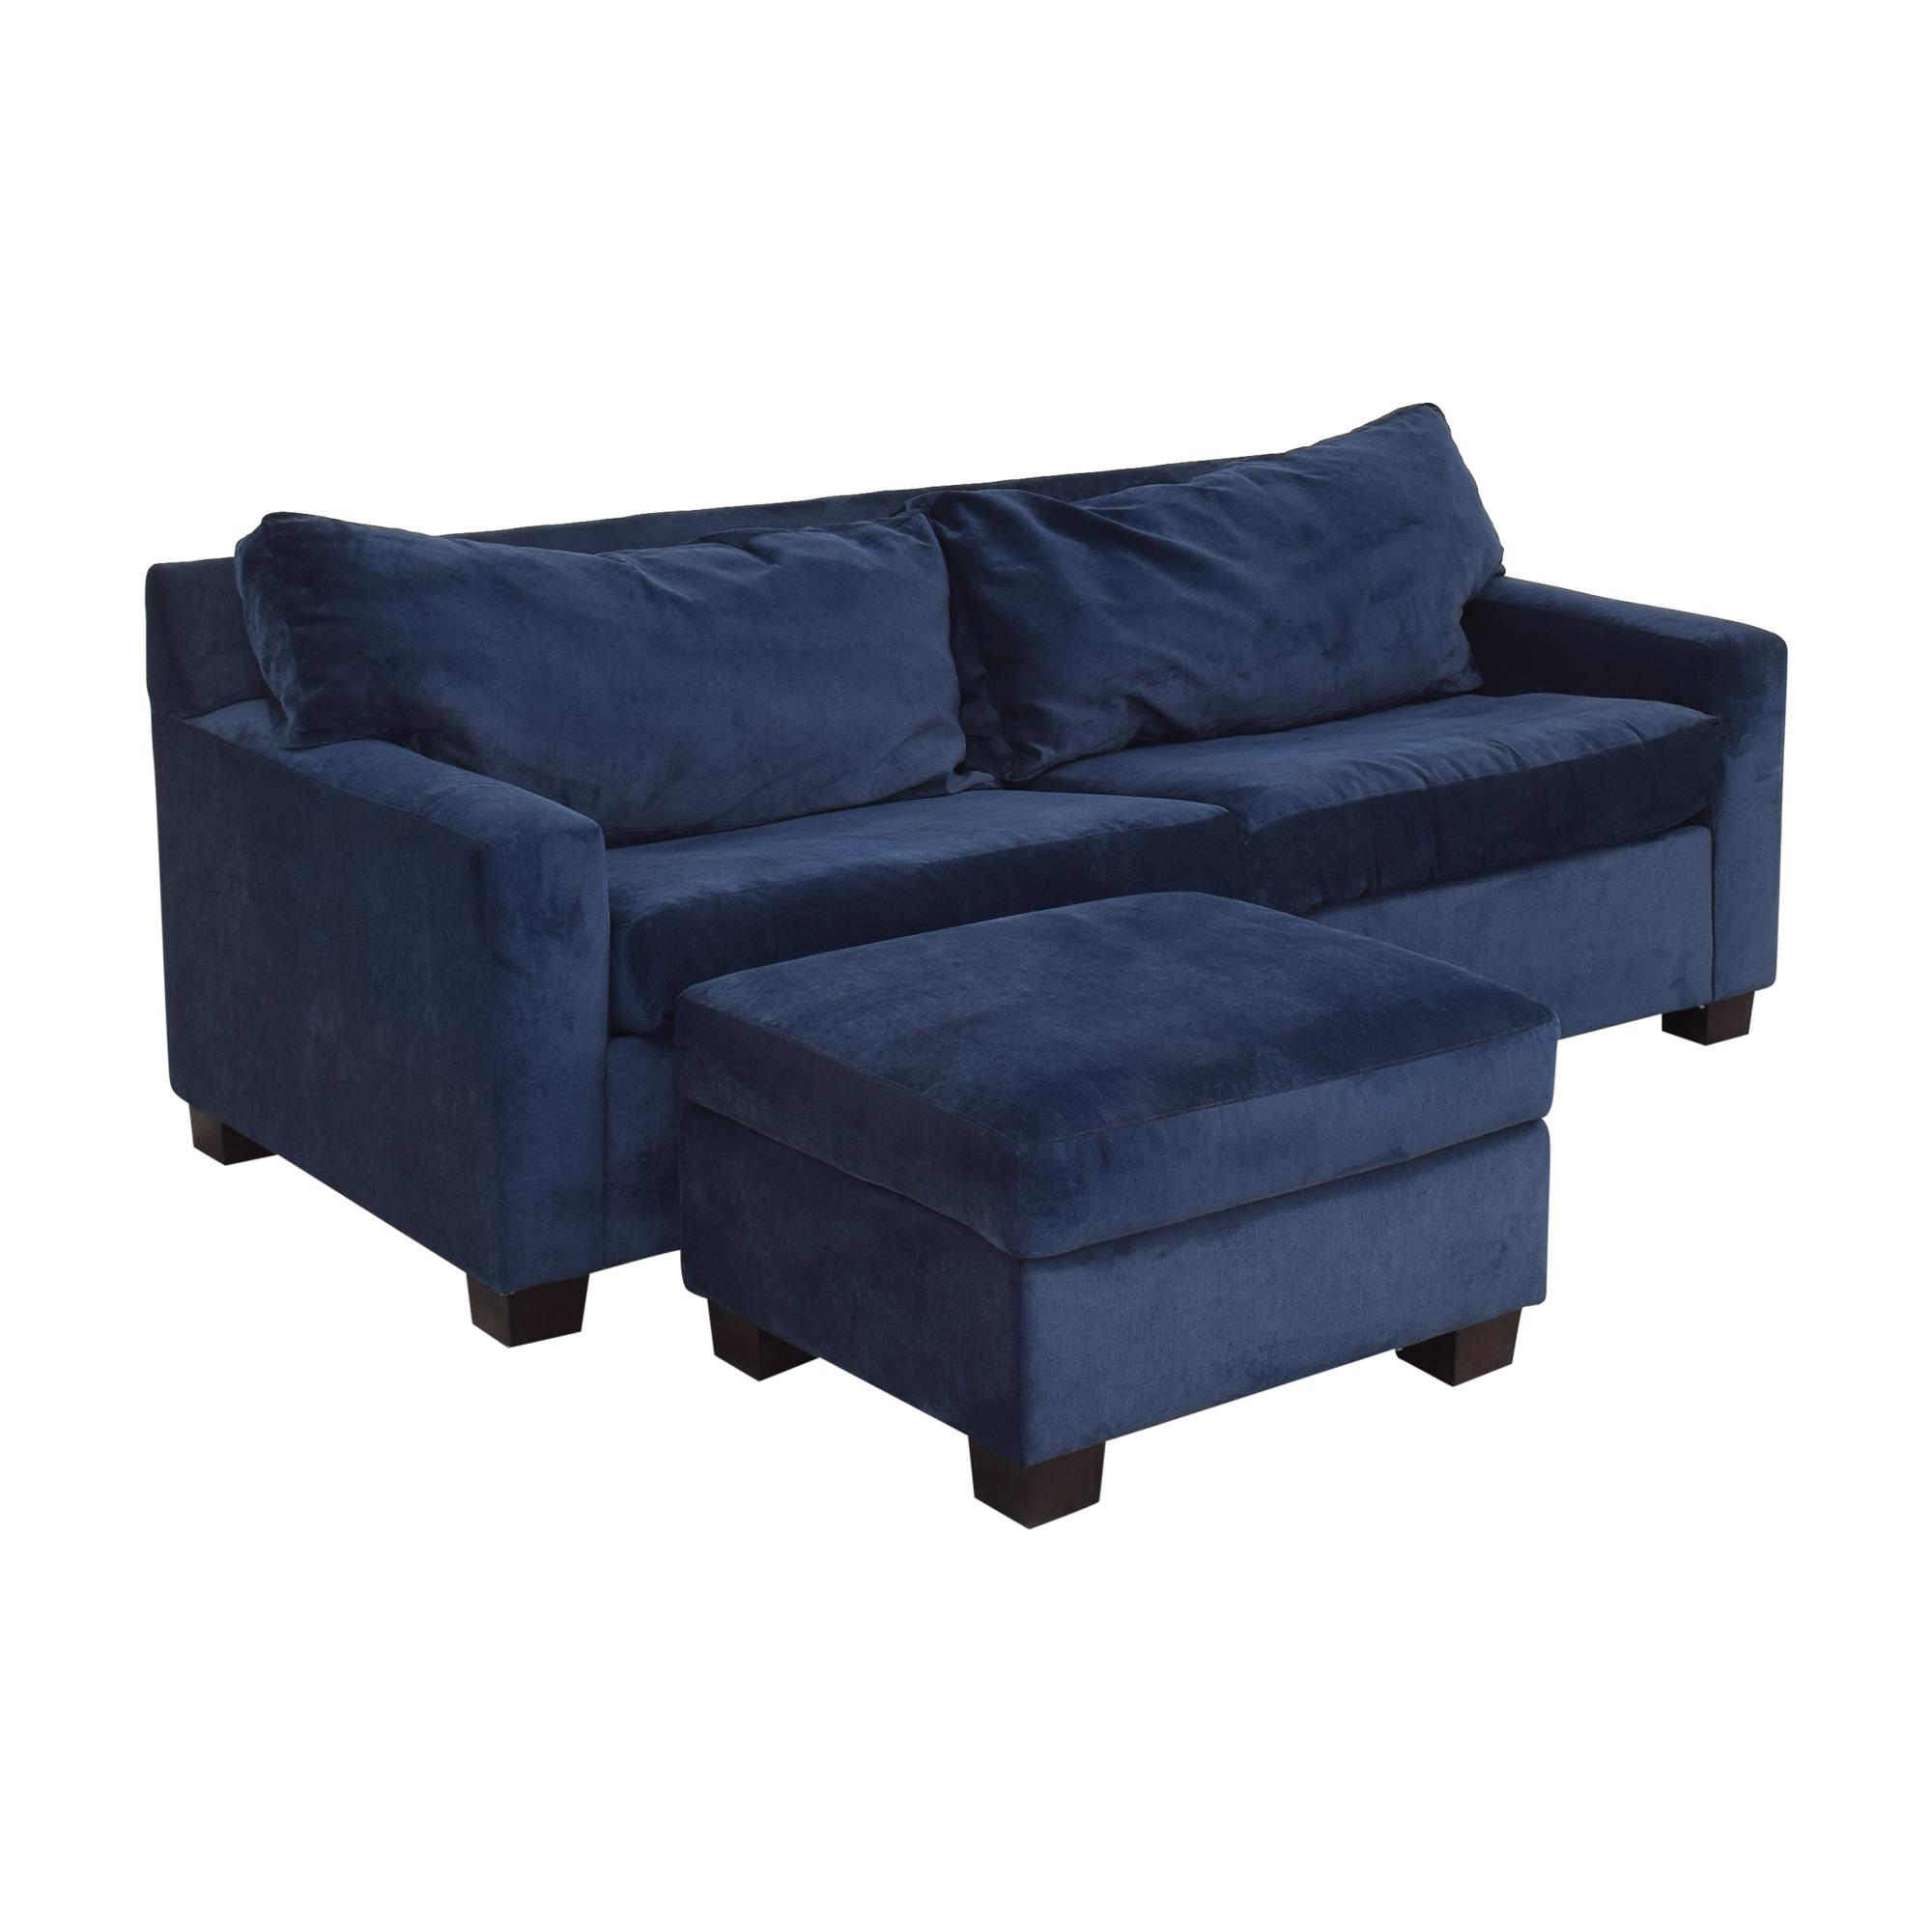 Mitchell Gold + Bob Williams Mitchell Gold + Bob Williams Sleeper Sofa & Ottoman for sale